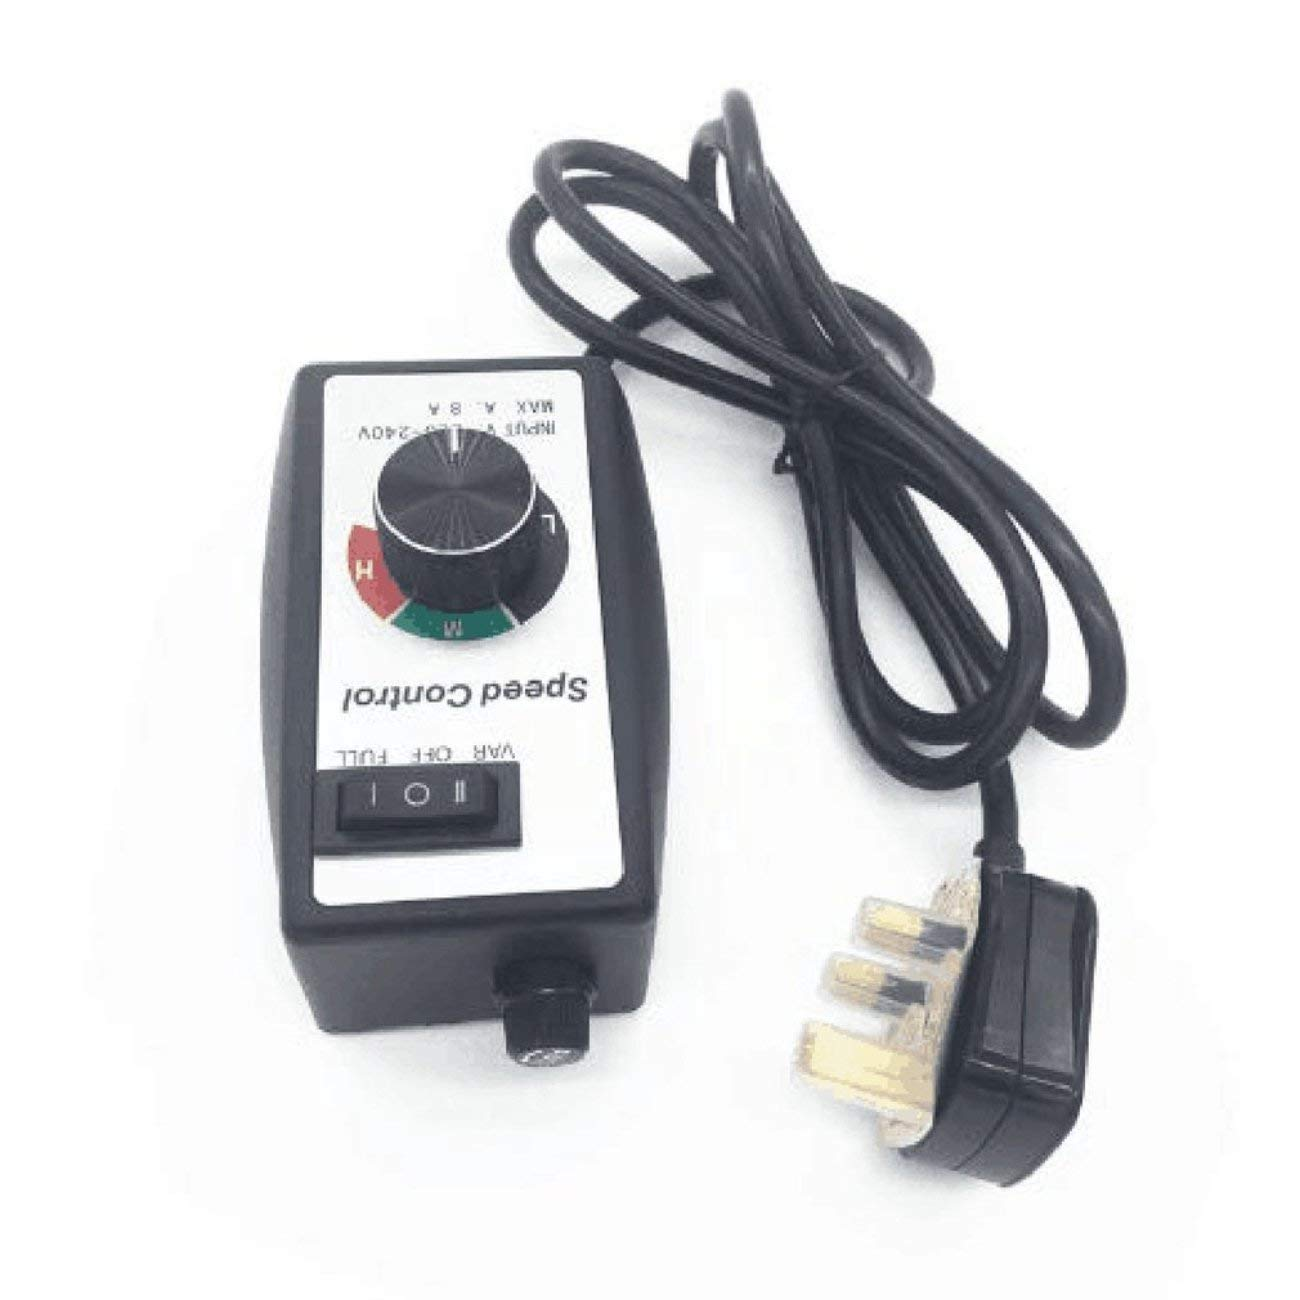 Elviray Electric Motor Rheosta Router Fan Variable Speed Controller Electric Motor Rheostat Electronic Control Equipment UK